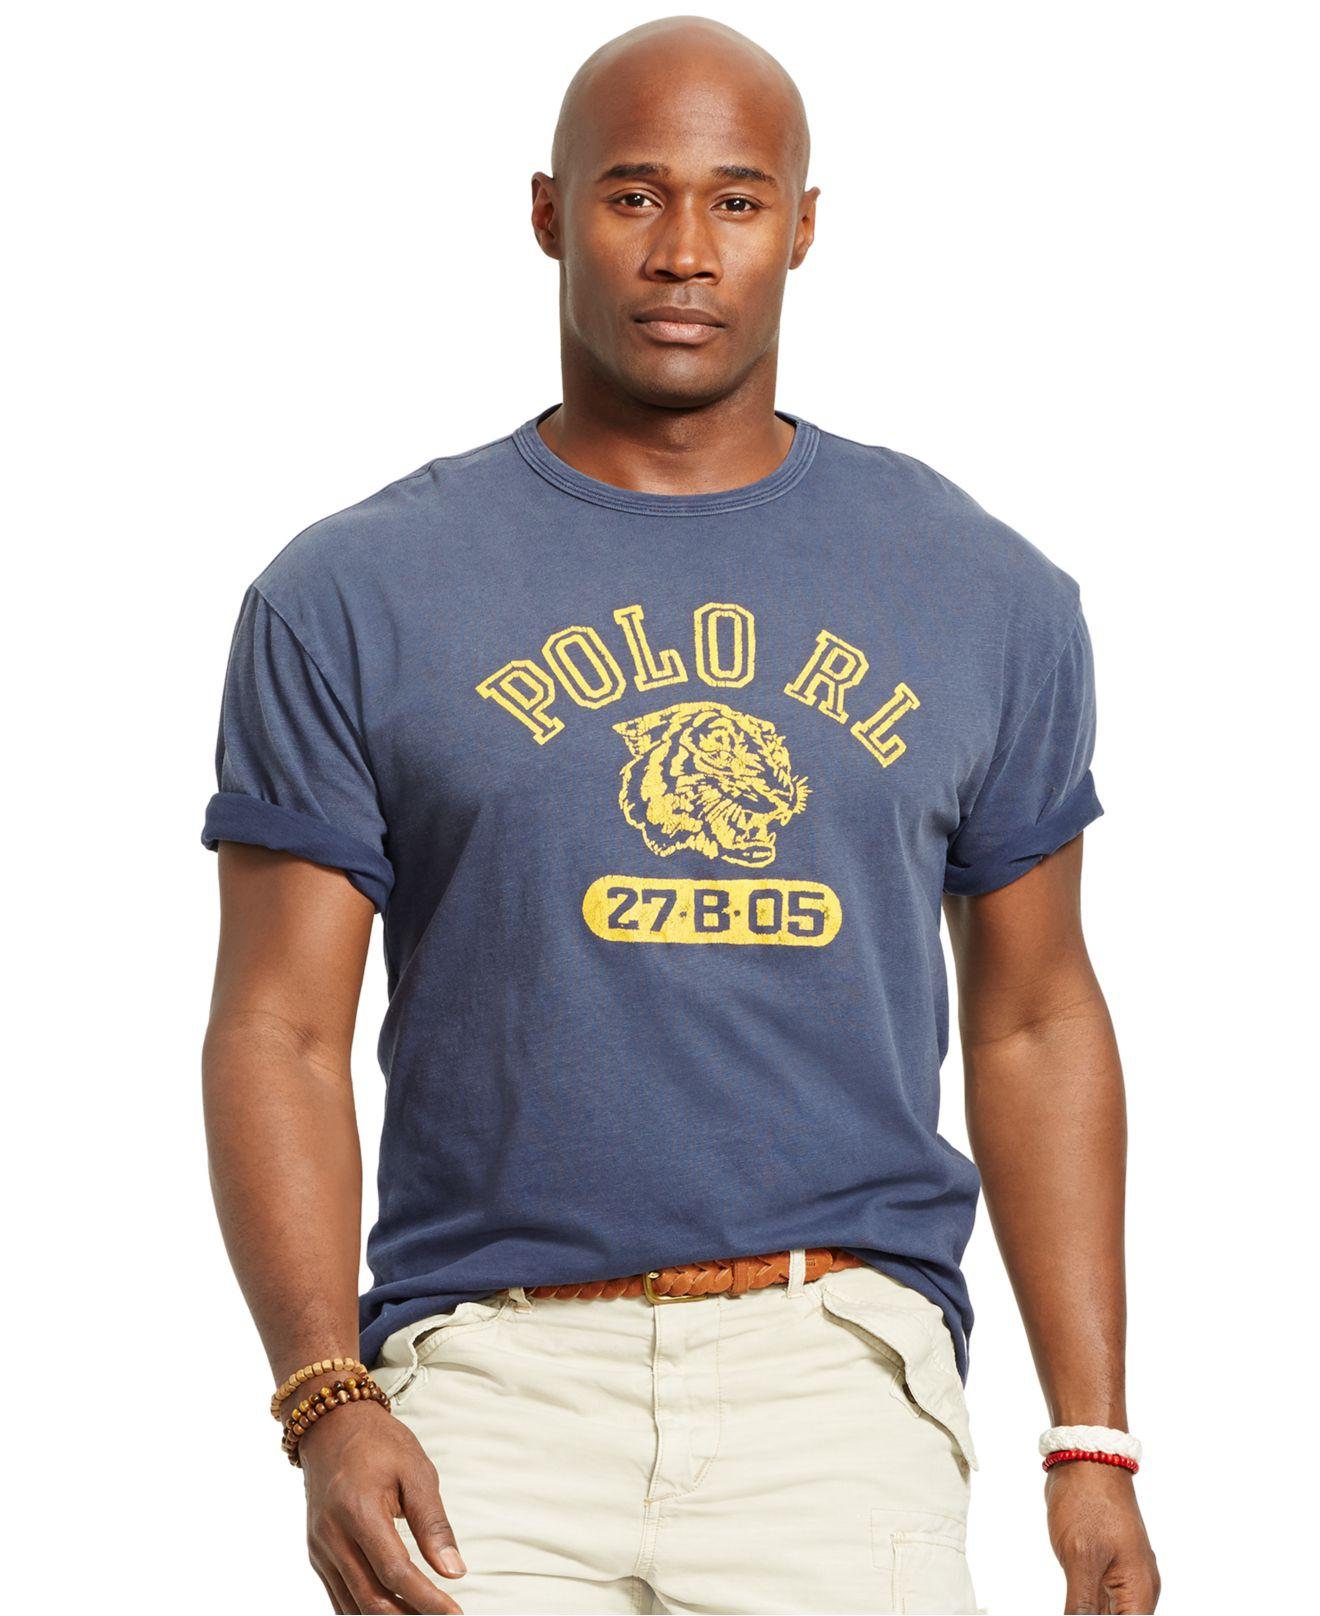 Ralph Lauren Polo Tee Shirts Mens